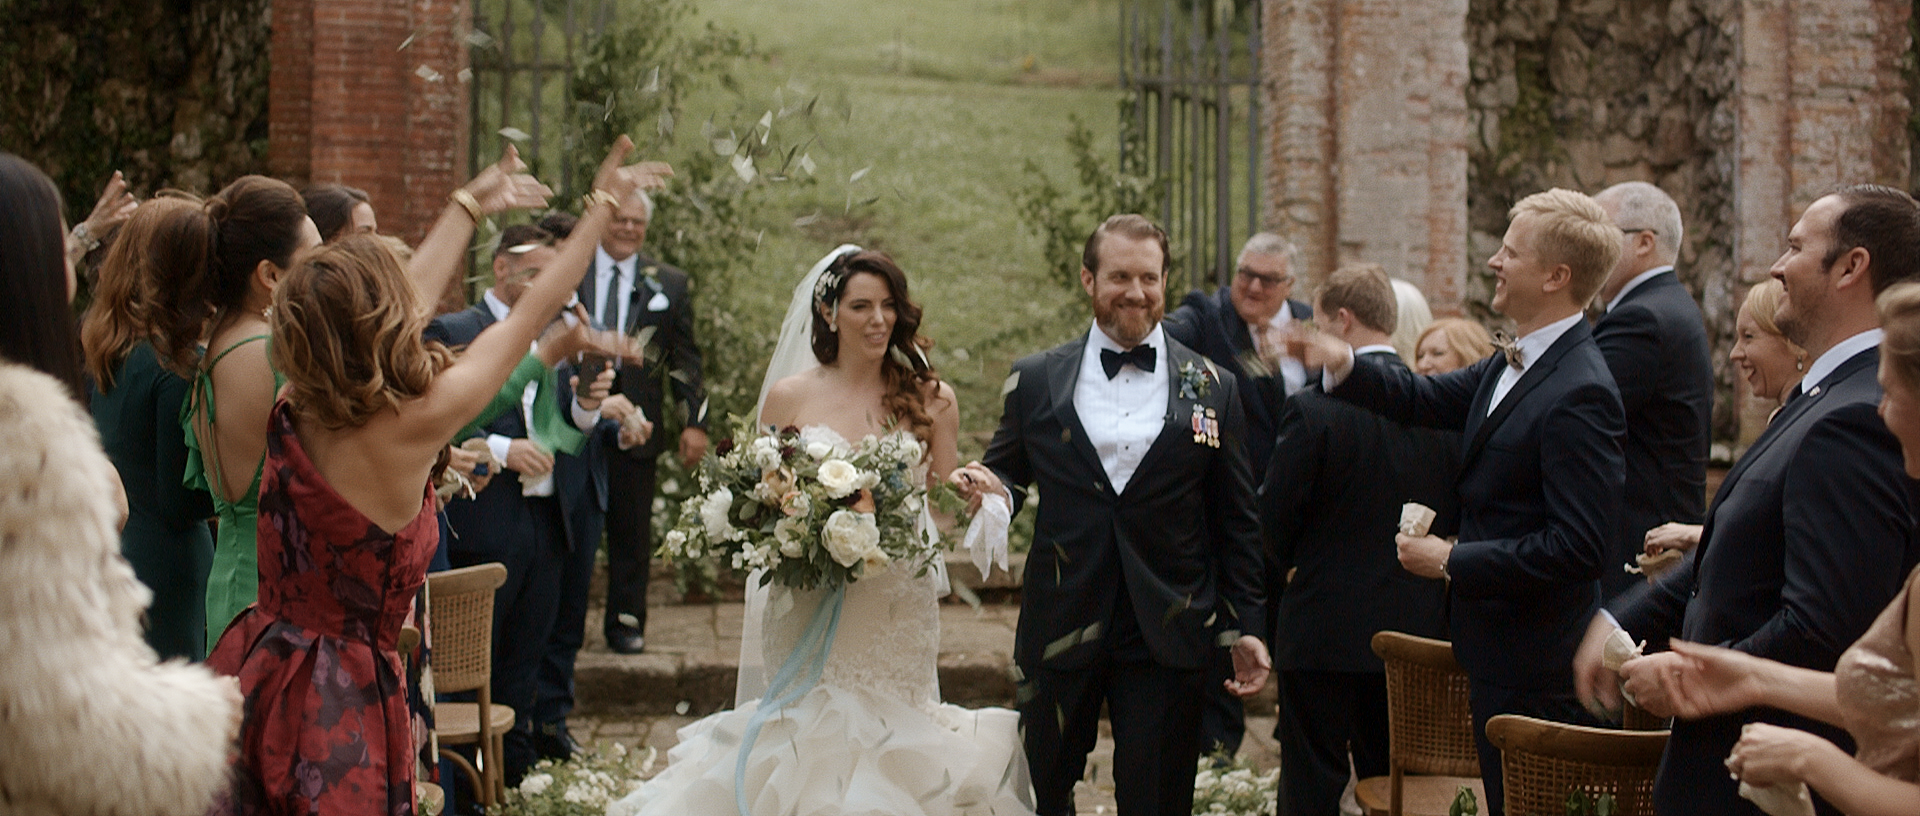 Lisa + Jim | Lucca, Italy | Villa Buonvisi